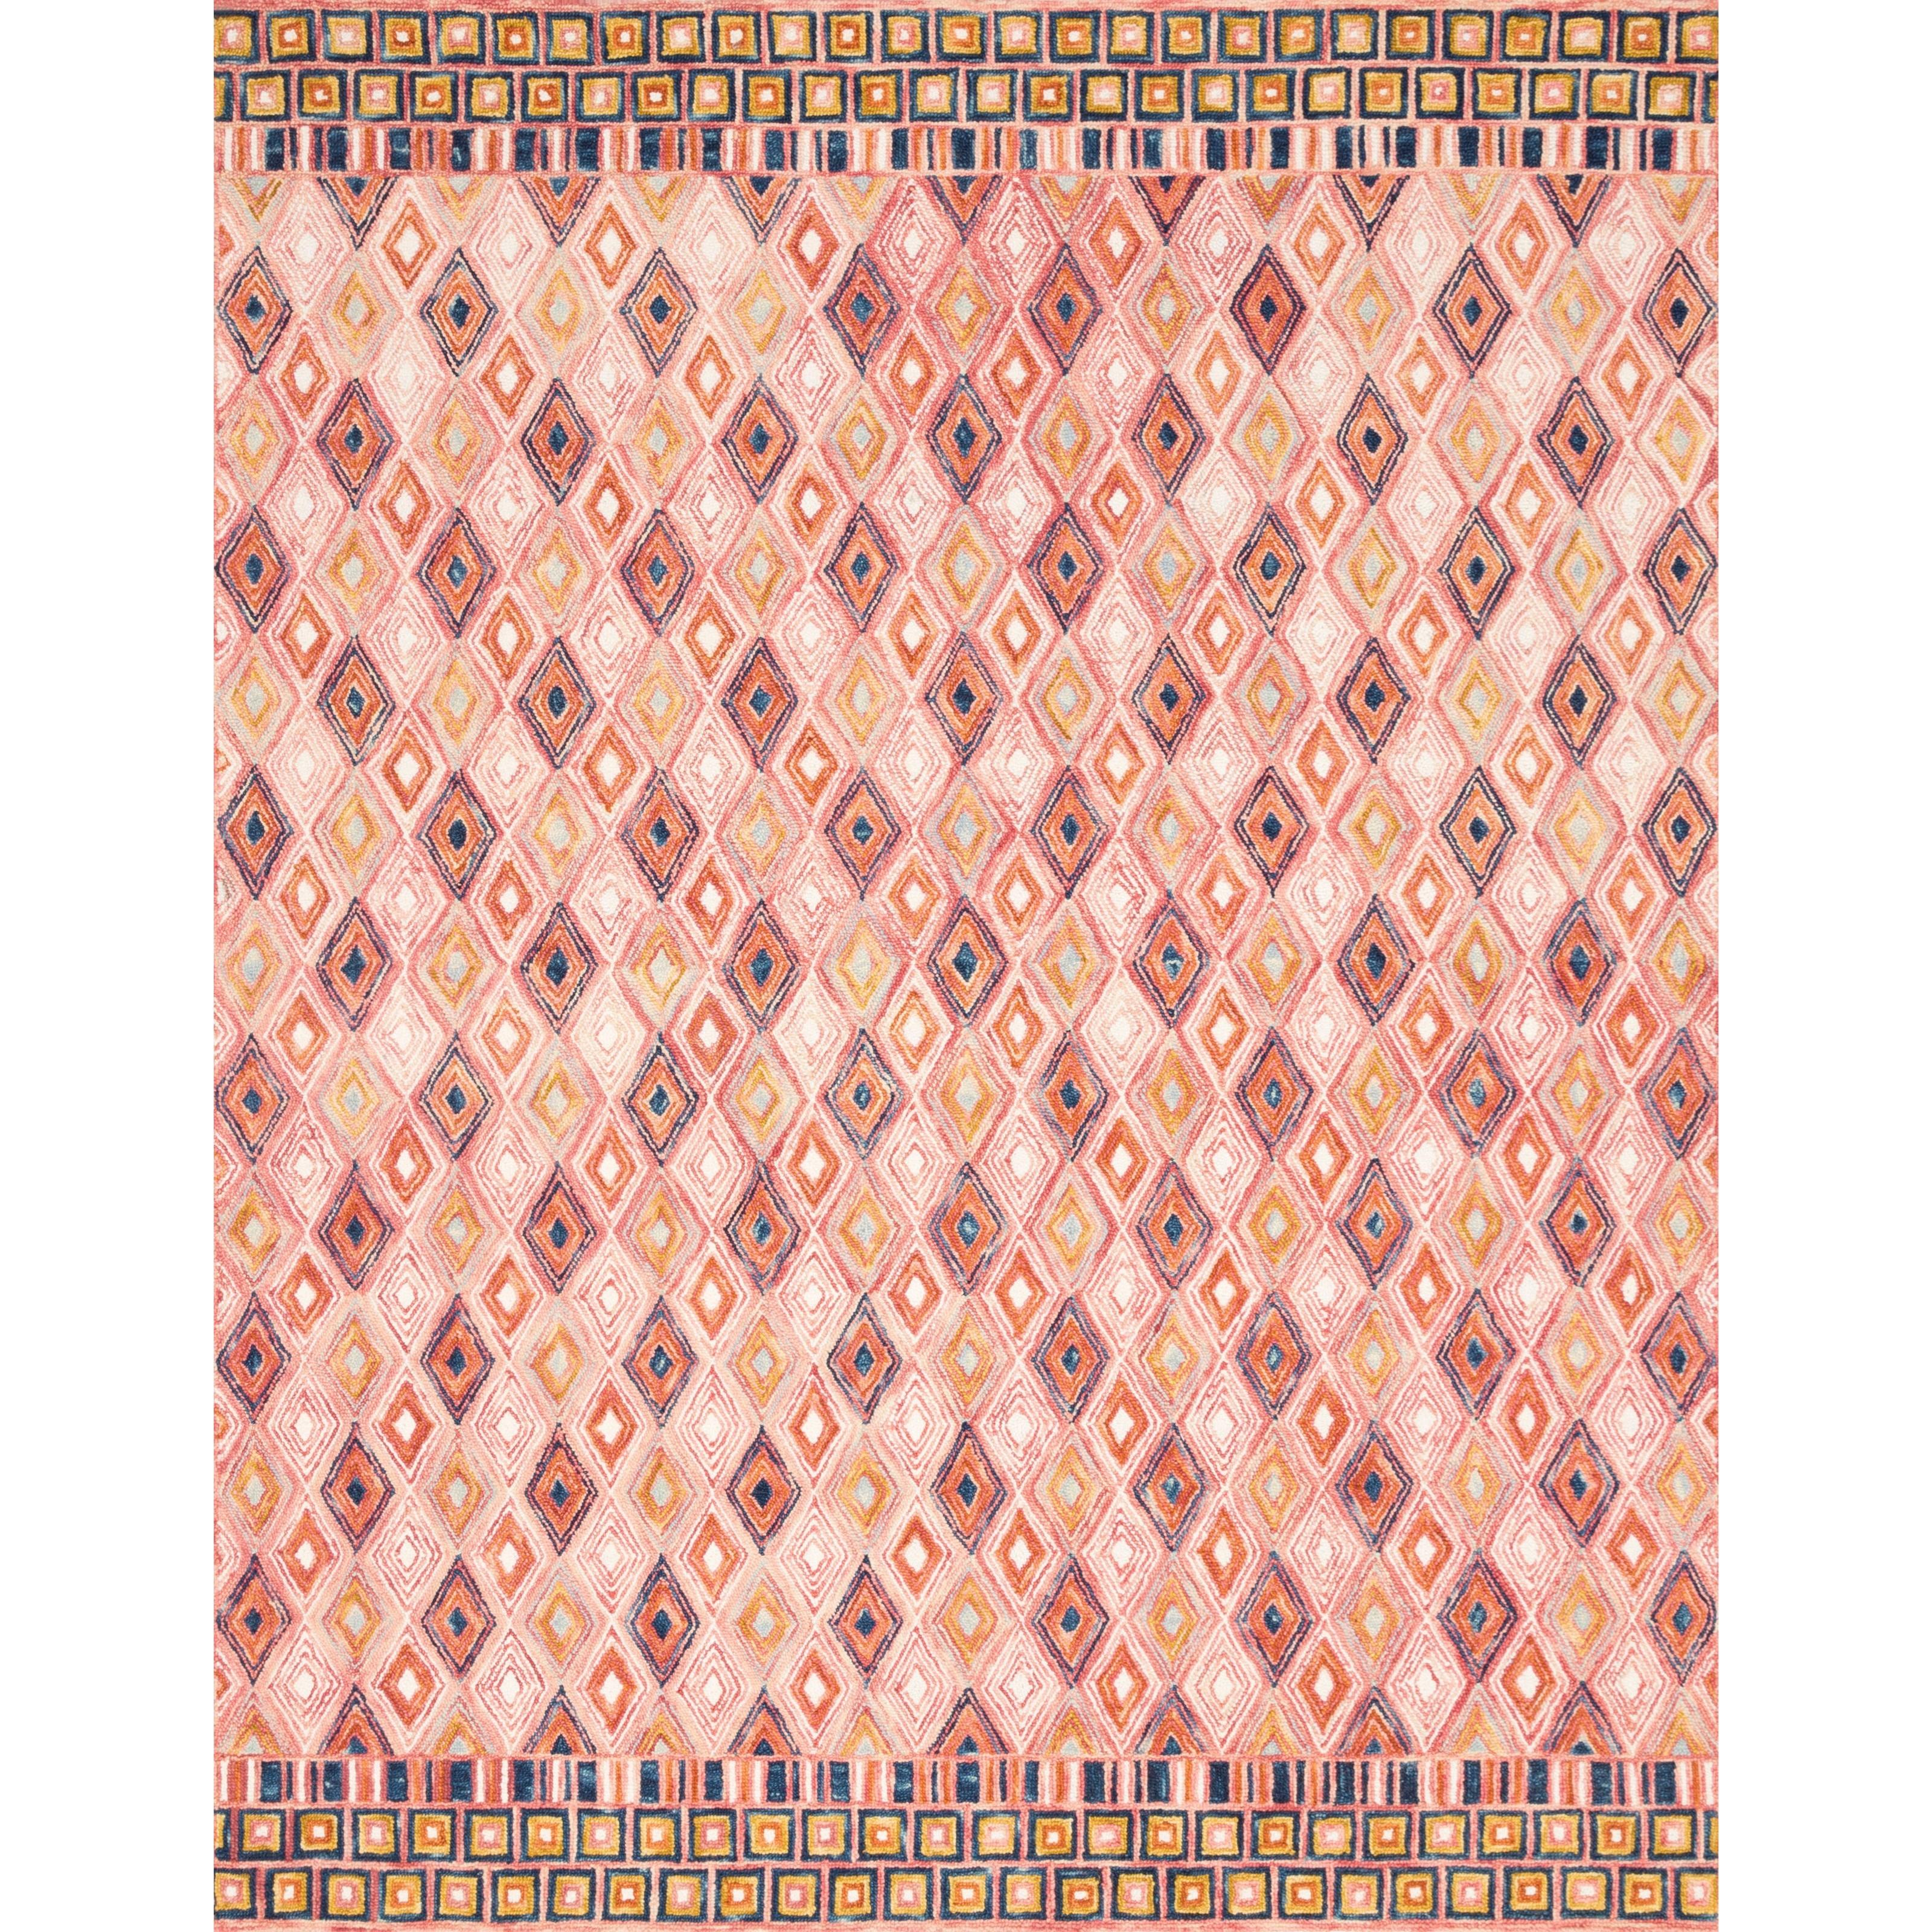 "Priti 2'3"" x 3'9"" Pink / Sunset Rug by Loloi Rugs at Virginia Furniture Market"